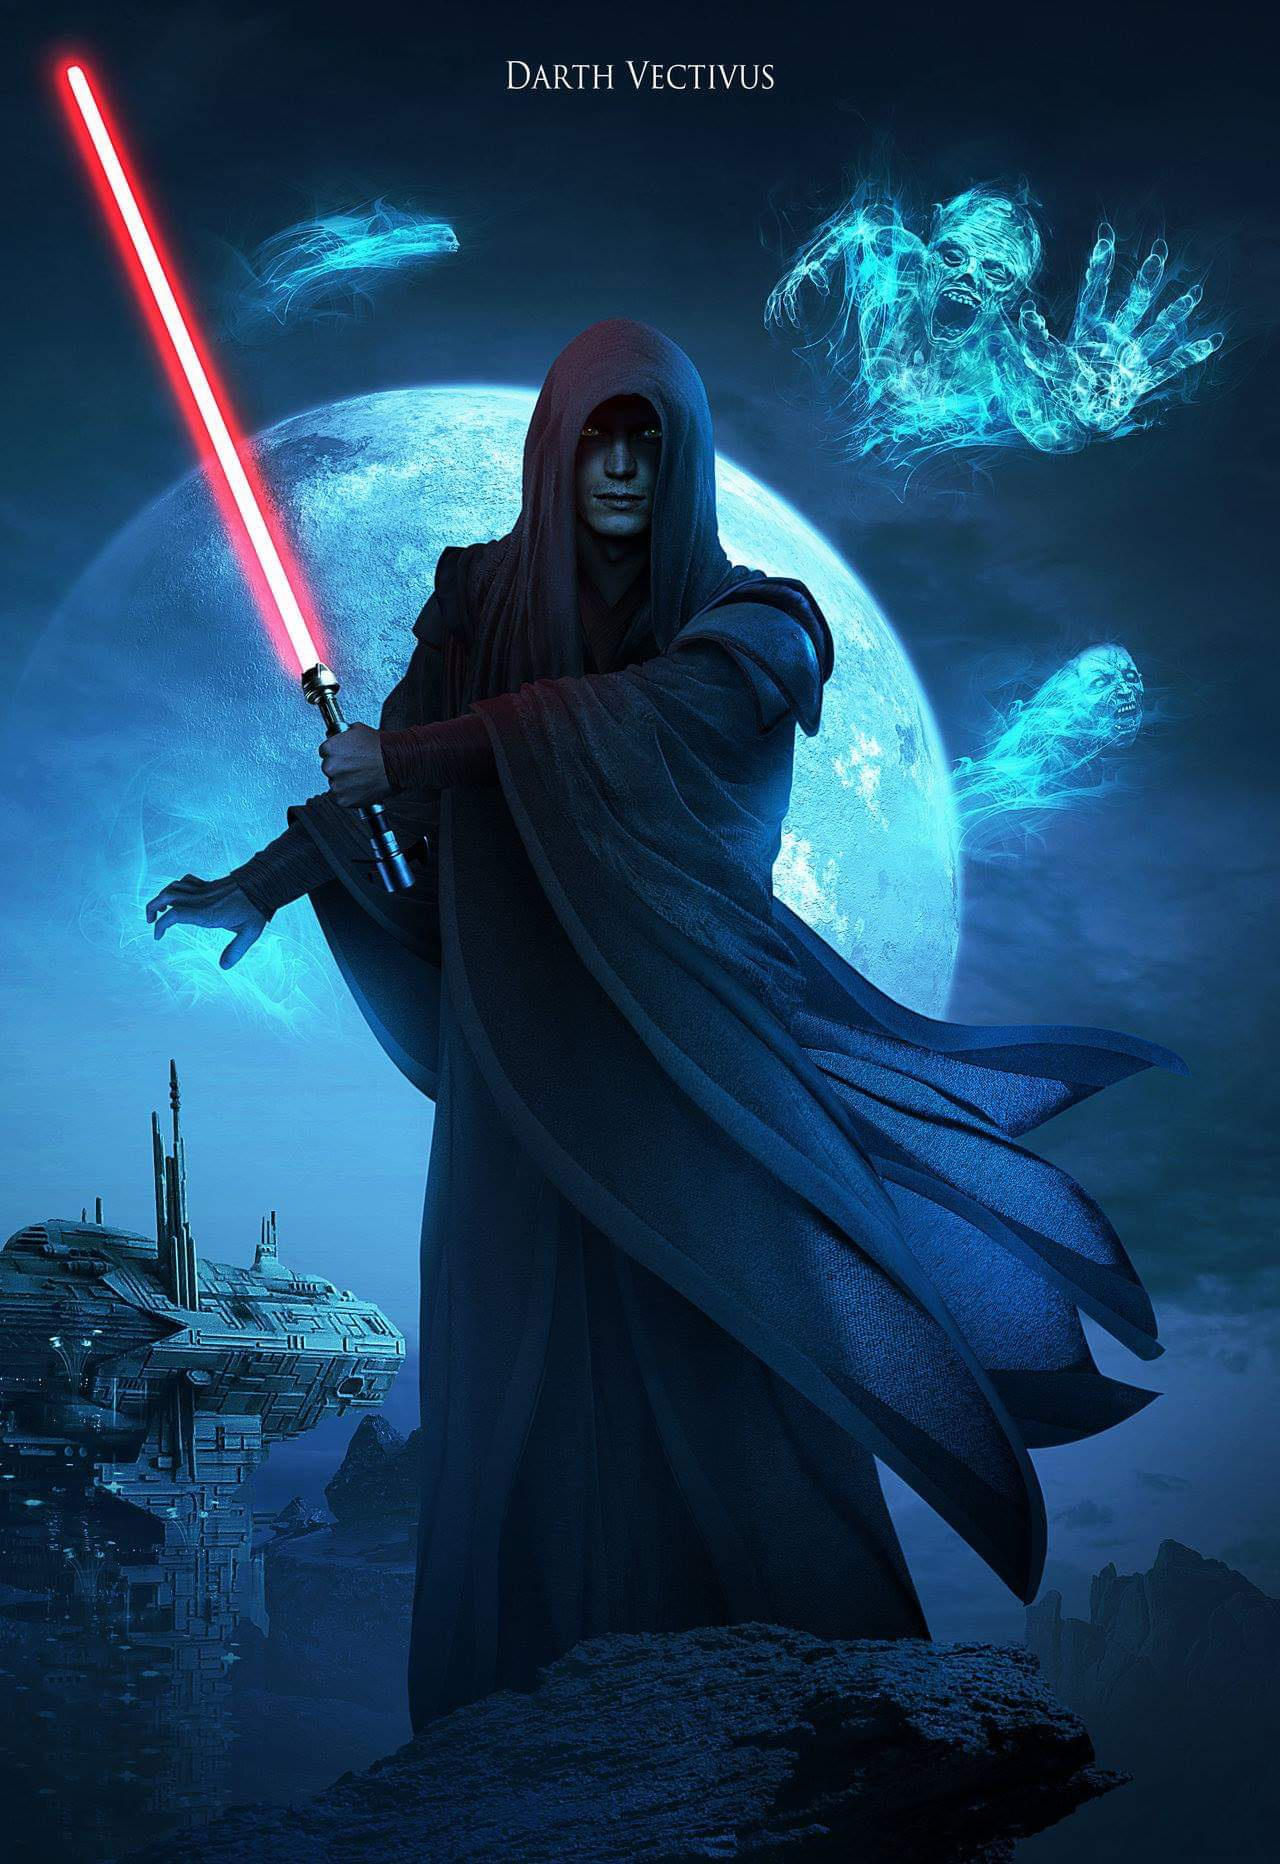 Darth Vectivus: The Good Sith Lord Star Wars